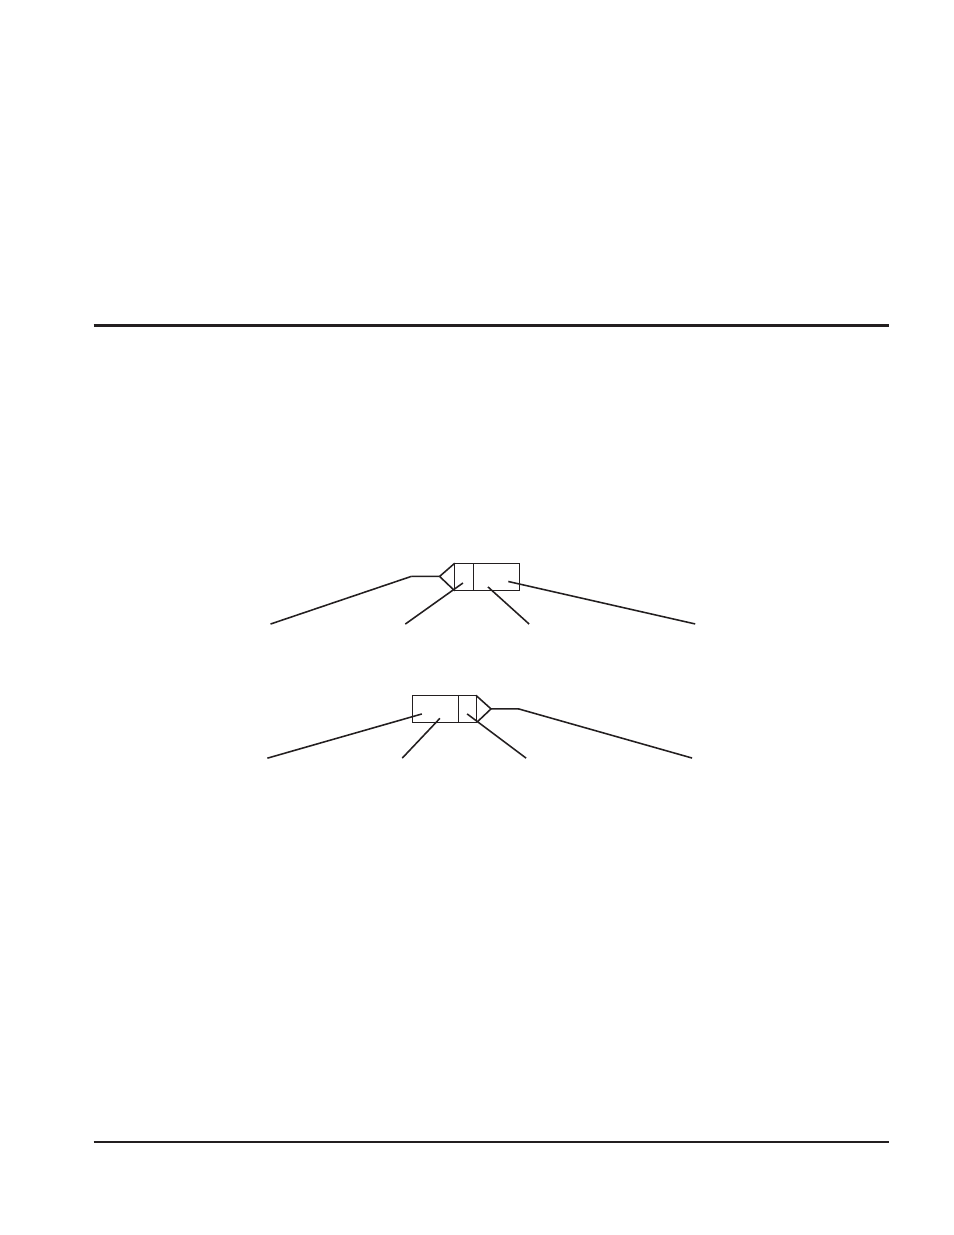 Section 7 Wiring Diagrams  Section 7 Wiring Diagrams